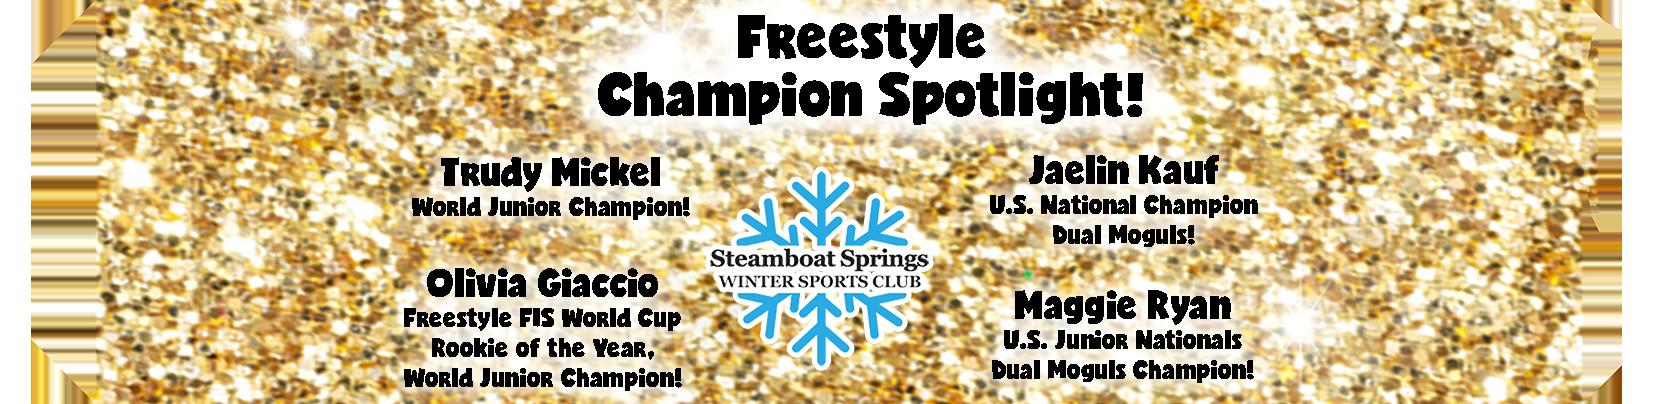 Freestyle Champion Spotlight